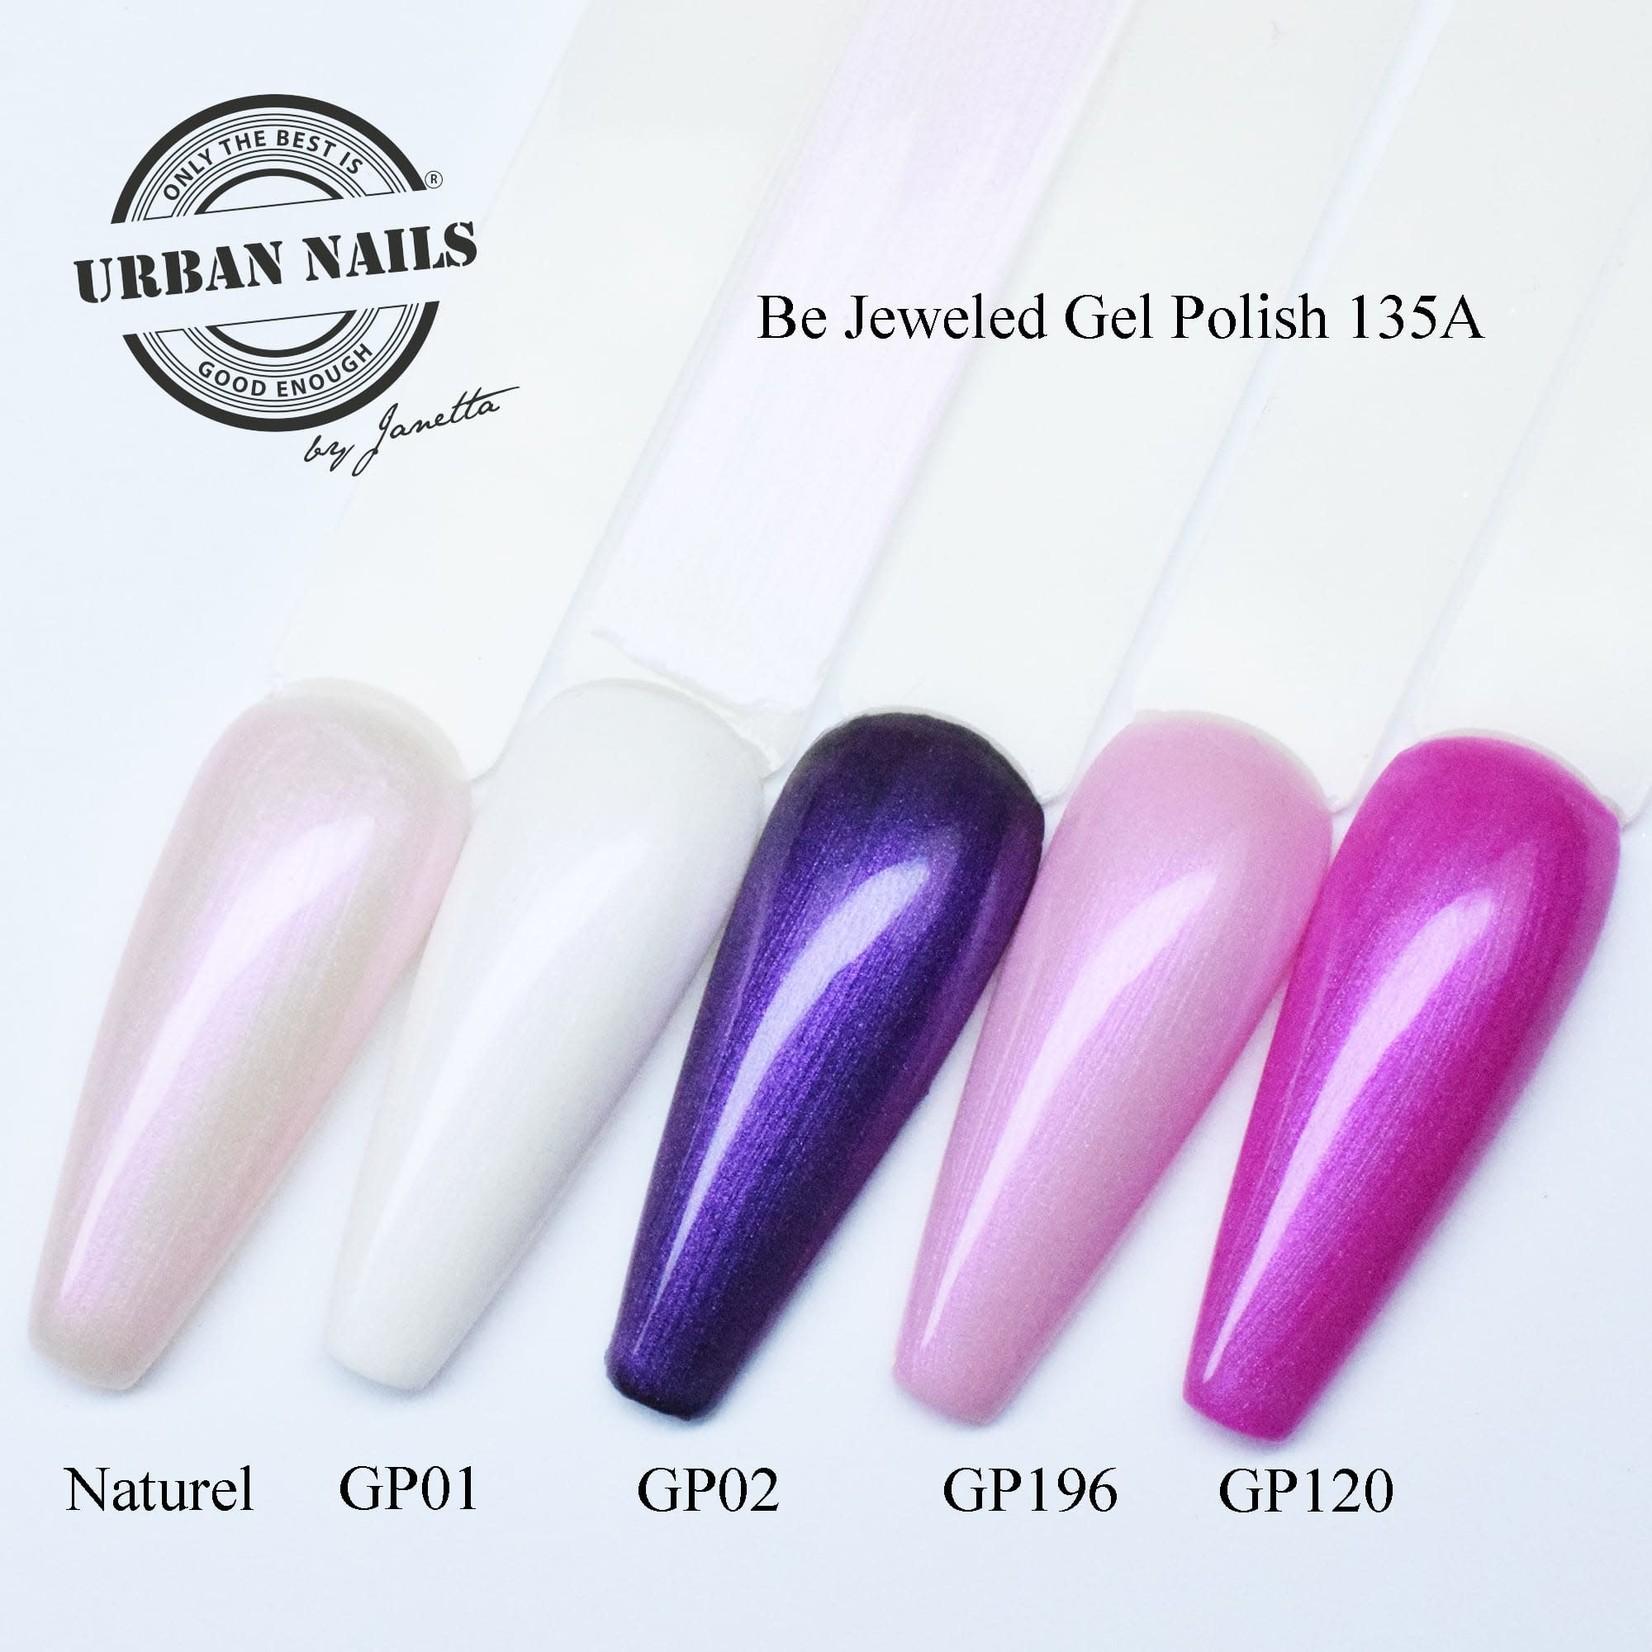 Urban Nails Be Jeweled Gelpolish 135a Parelmoer shine